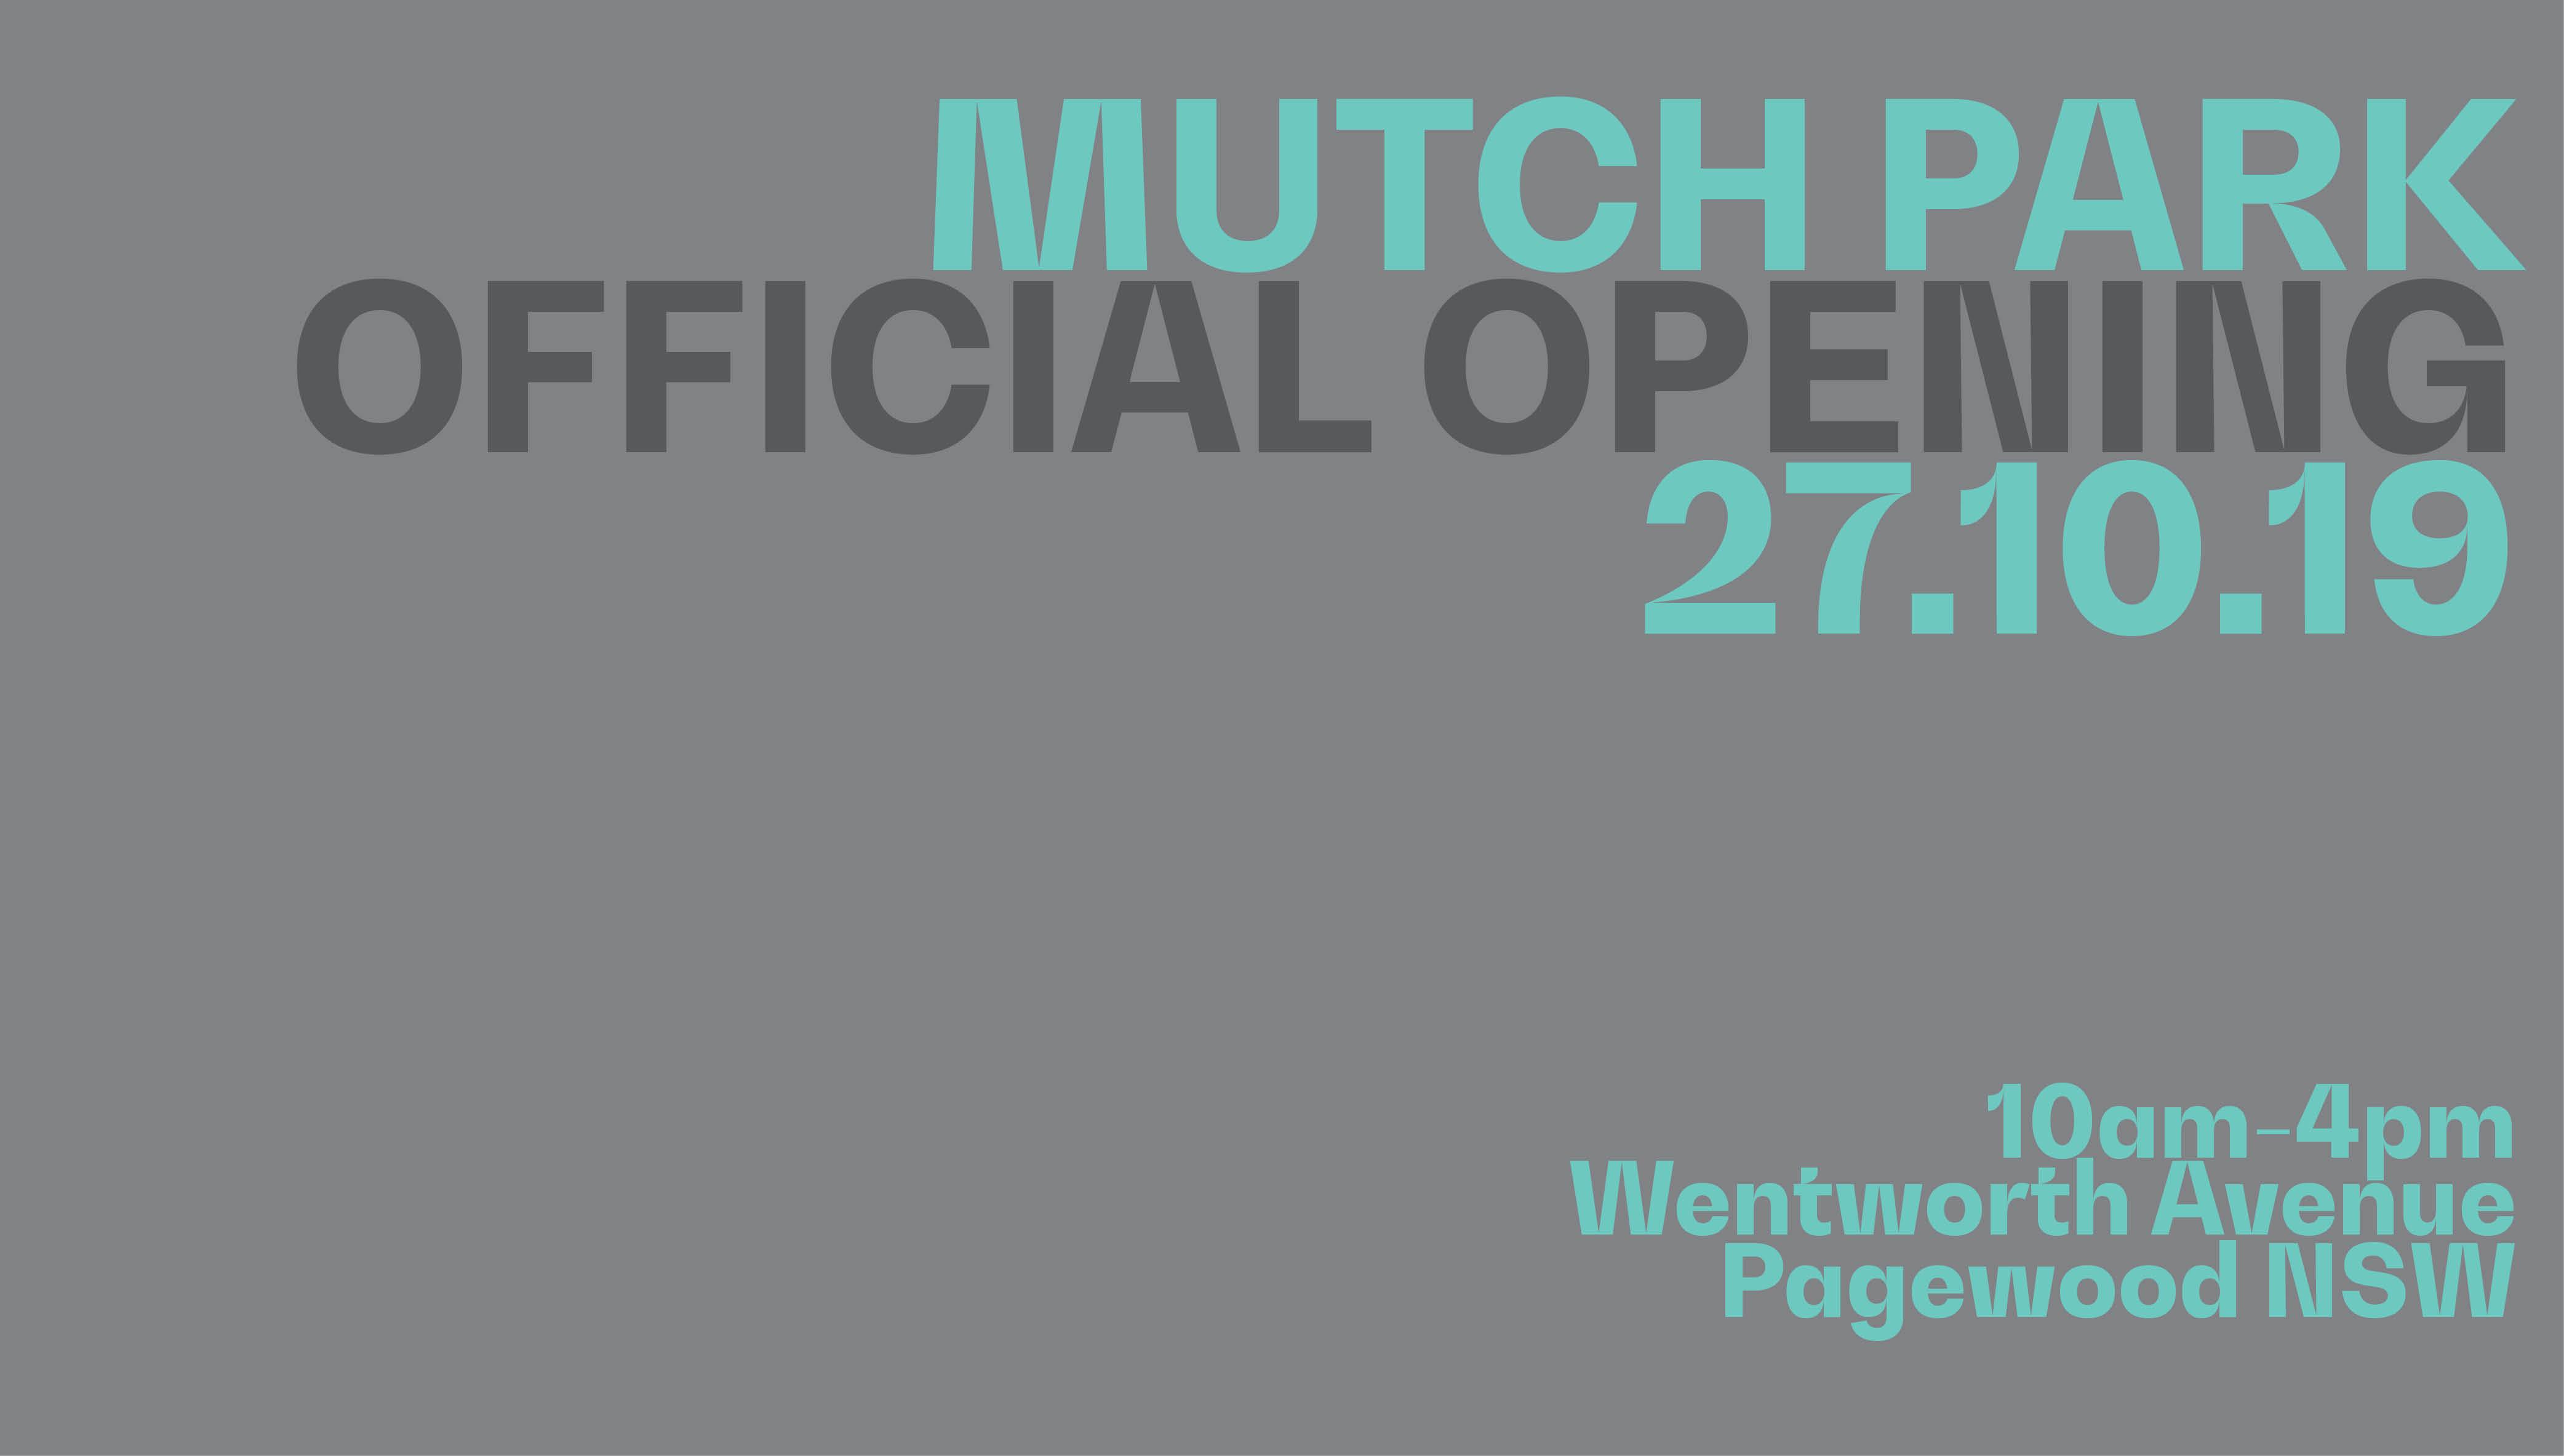 Mutch Park Opening